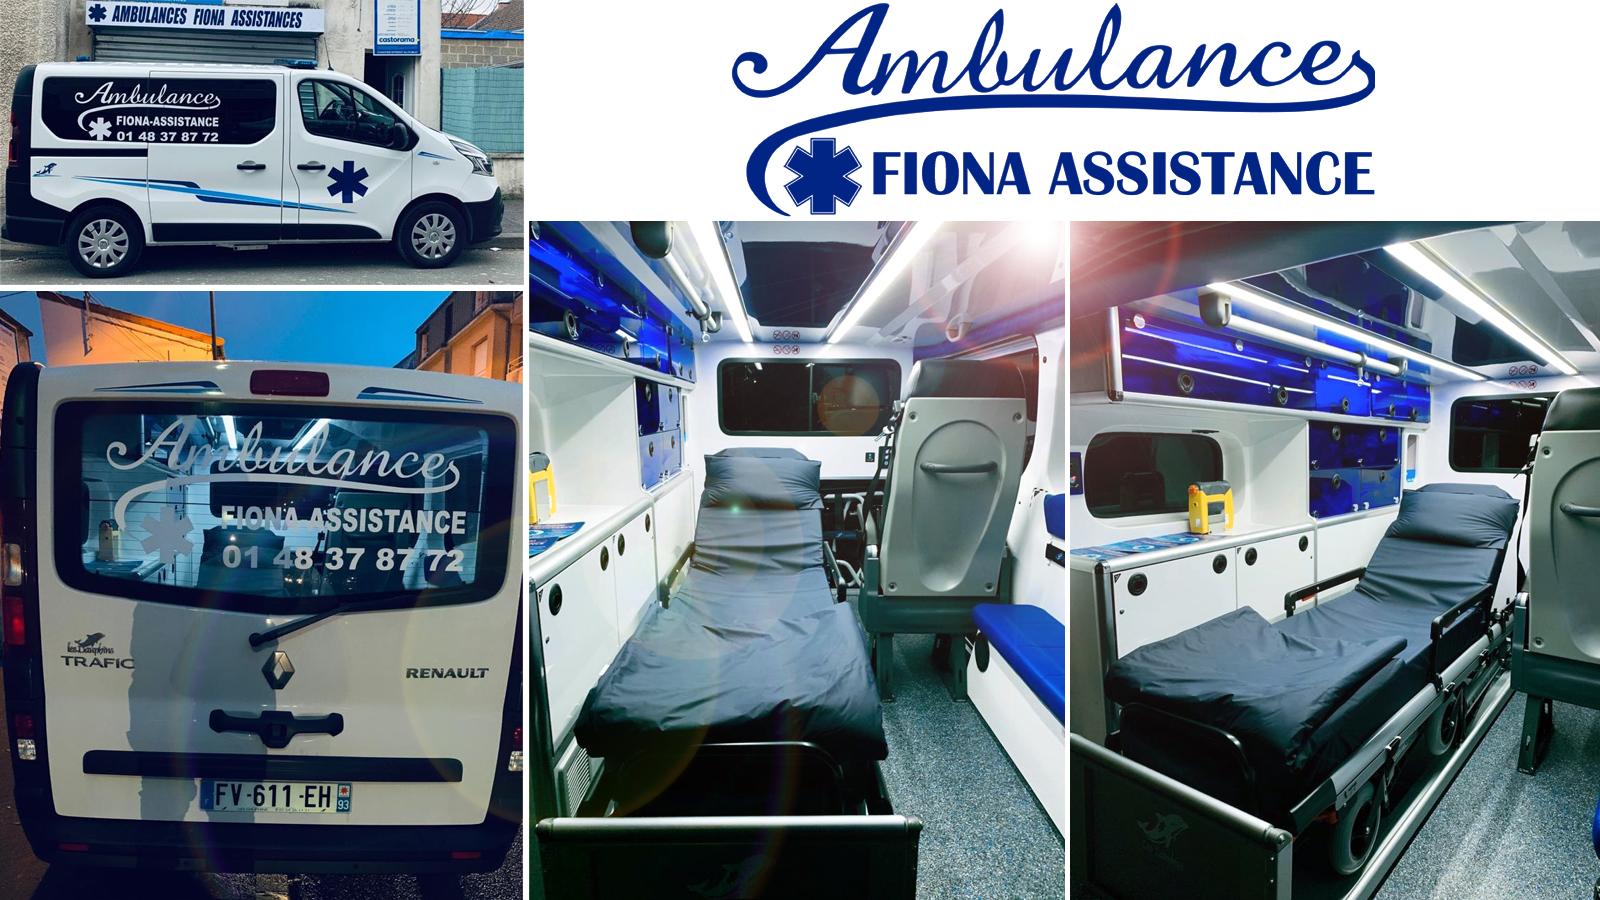 Ambulance ile de France